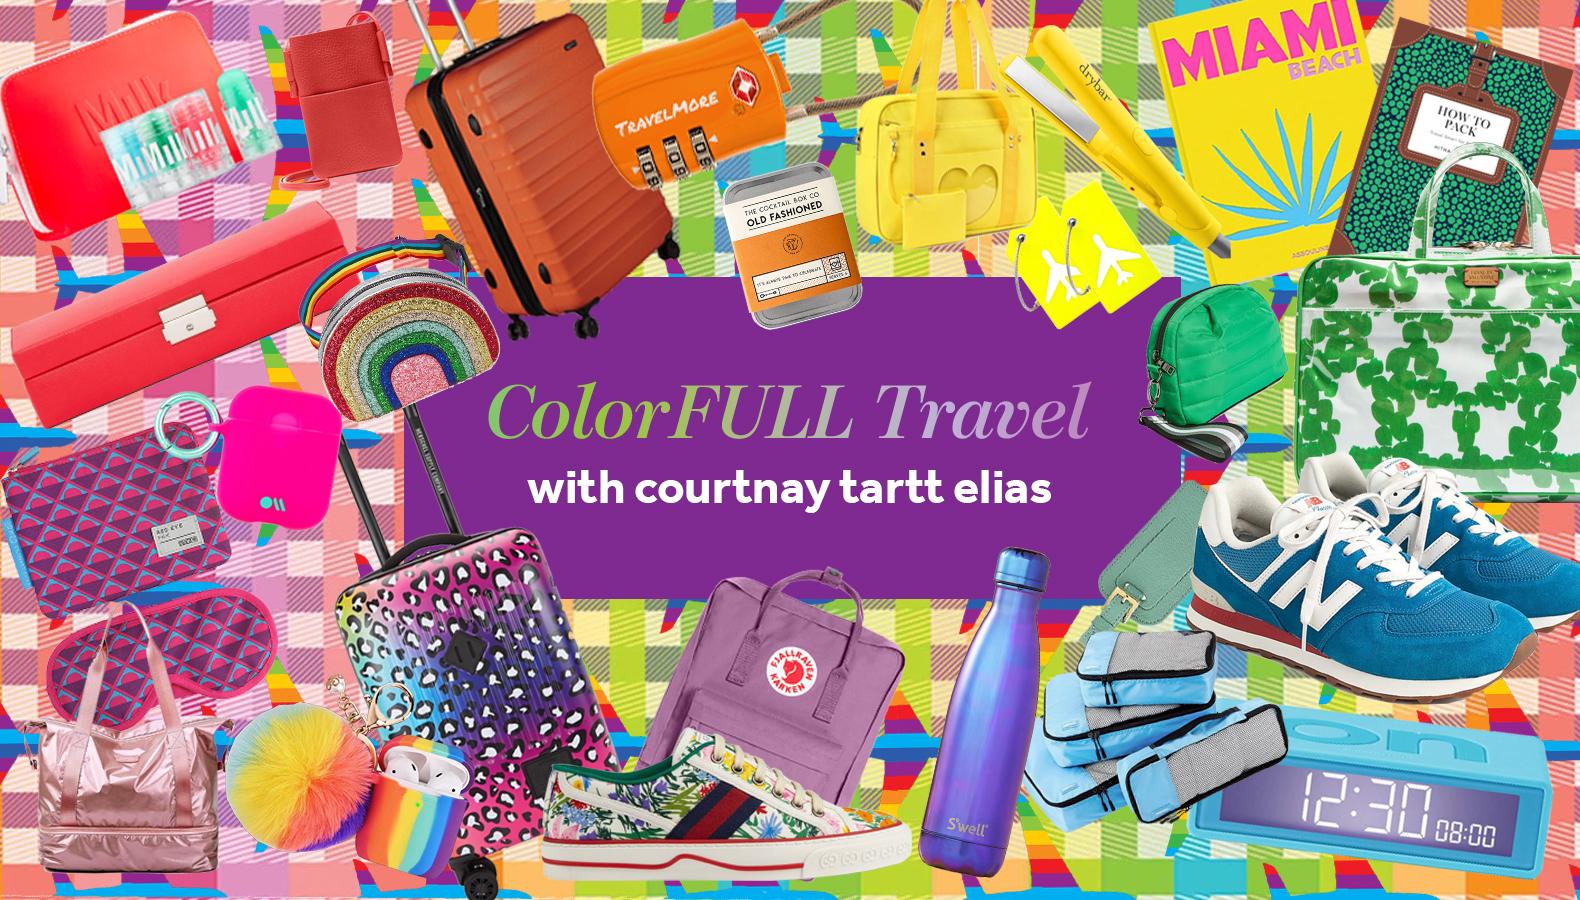 SHOP ColorFULL Travel Necessities